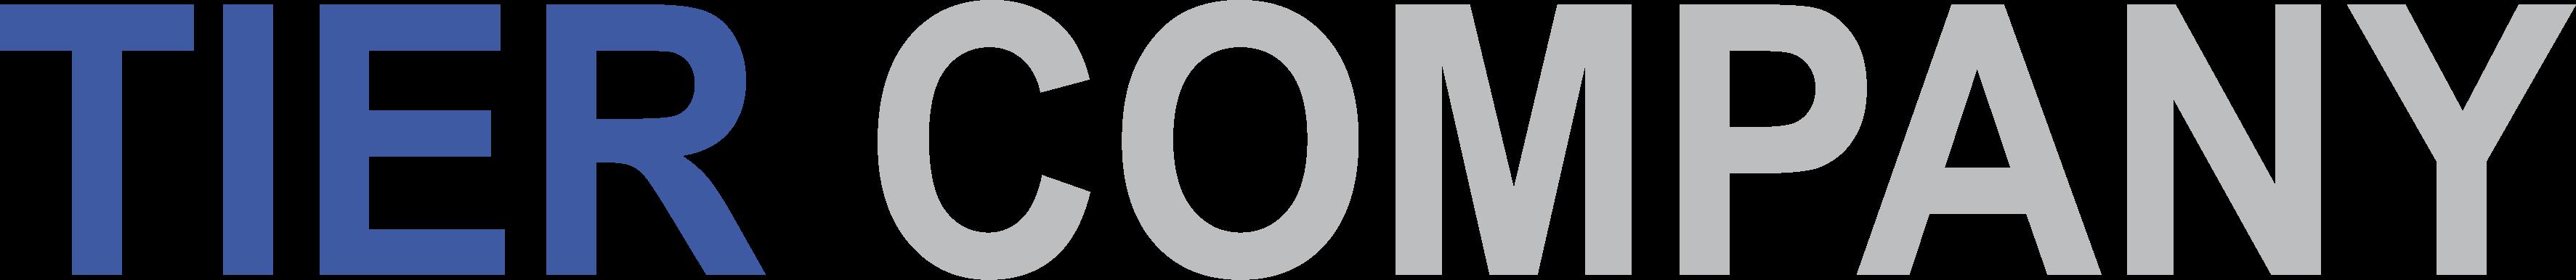 Tier Company